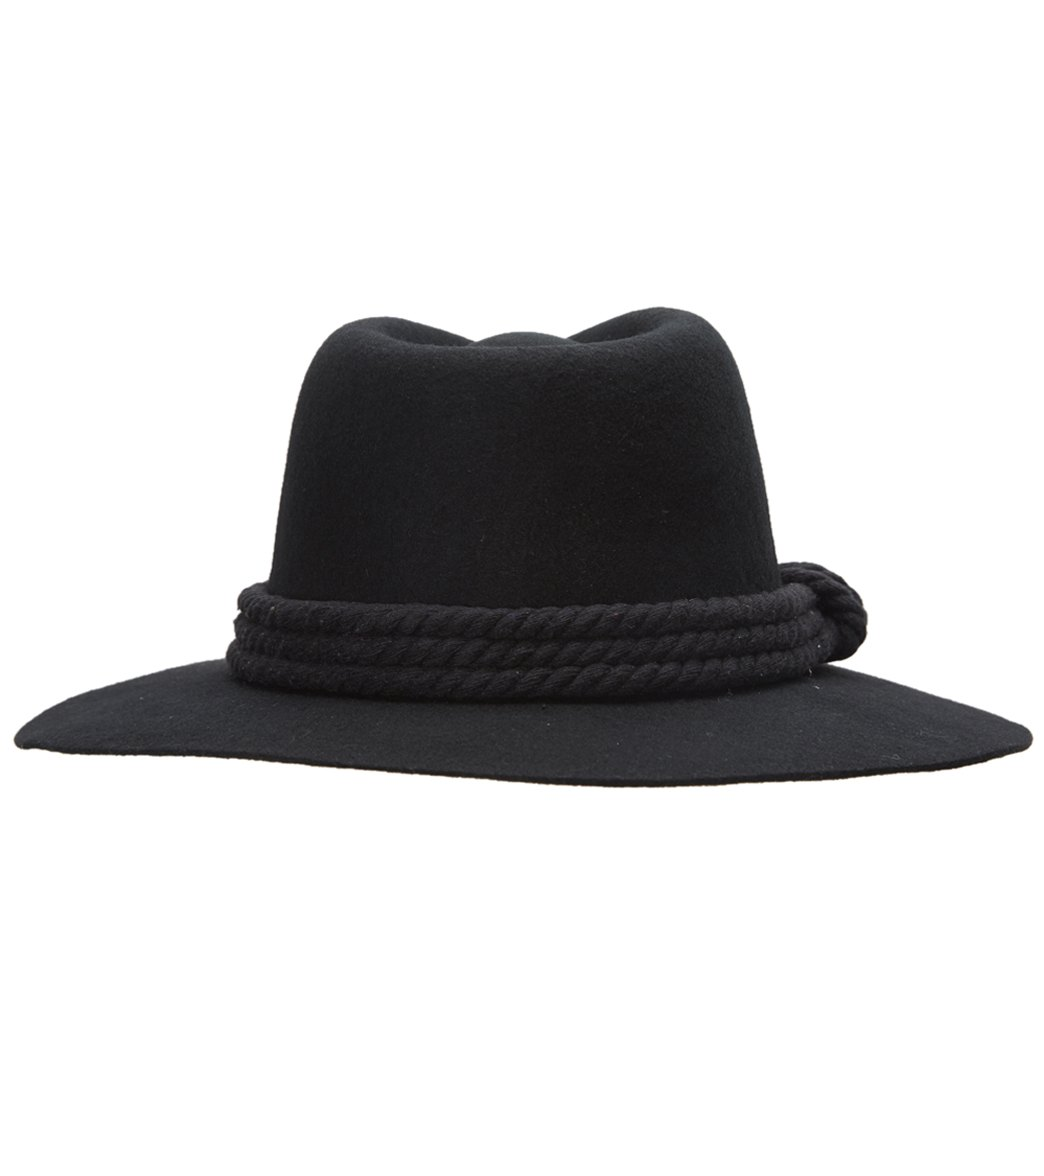 e78967361e988d Billabong Roped In Felt Hat at SwimOutlet.com